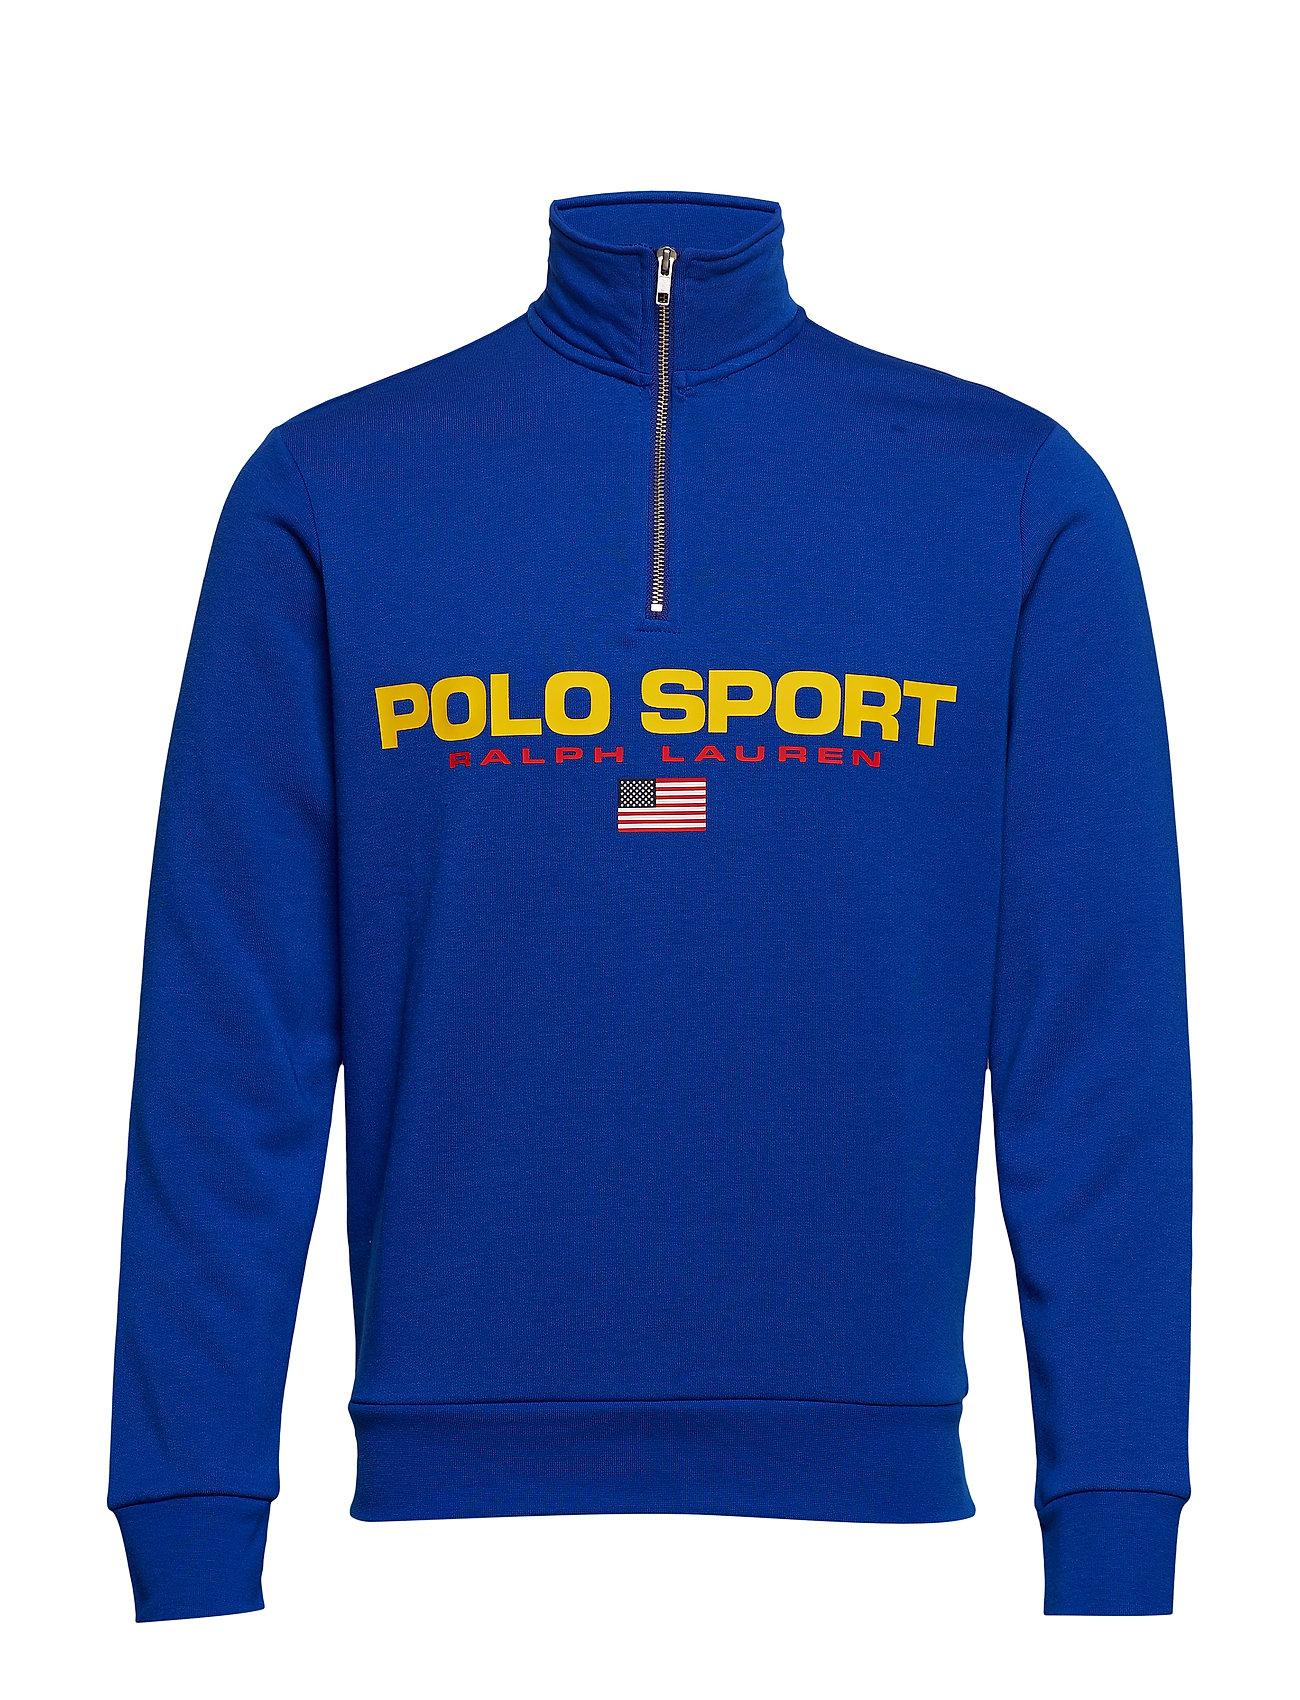 Polo Ralph Lauren Polo Sport Half-Zip Sweatshirt - SAPPHIRE STAR